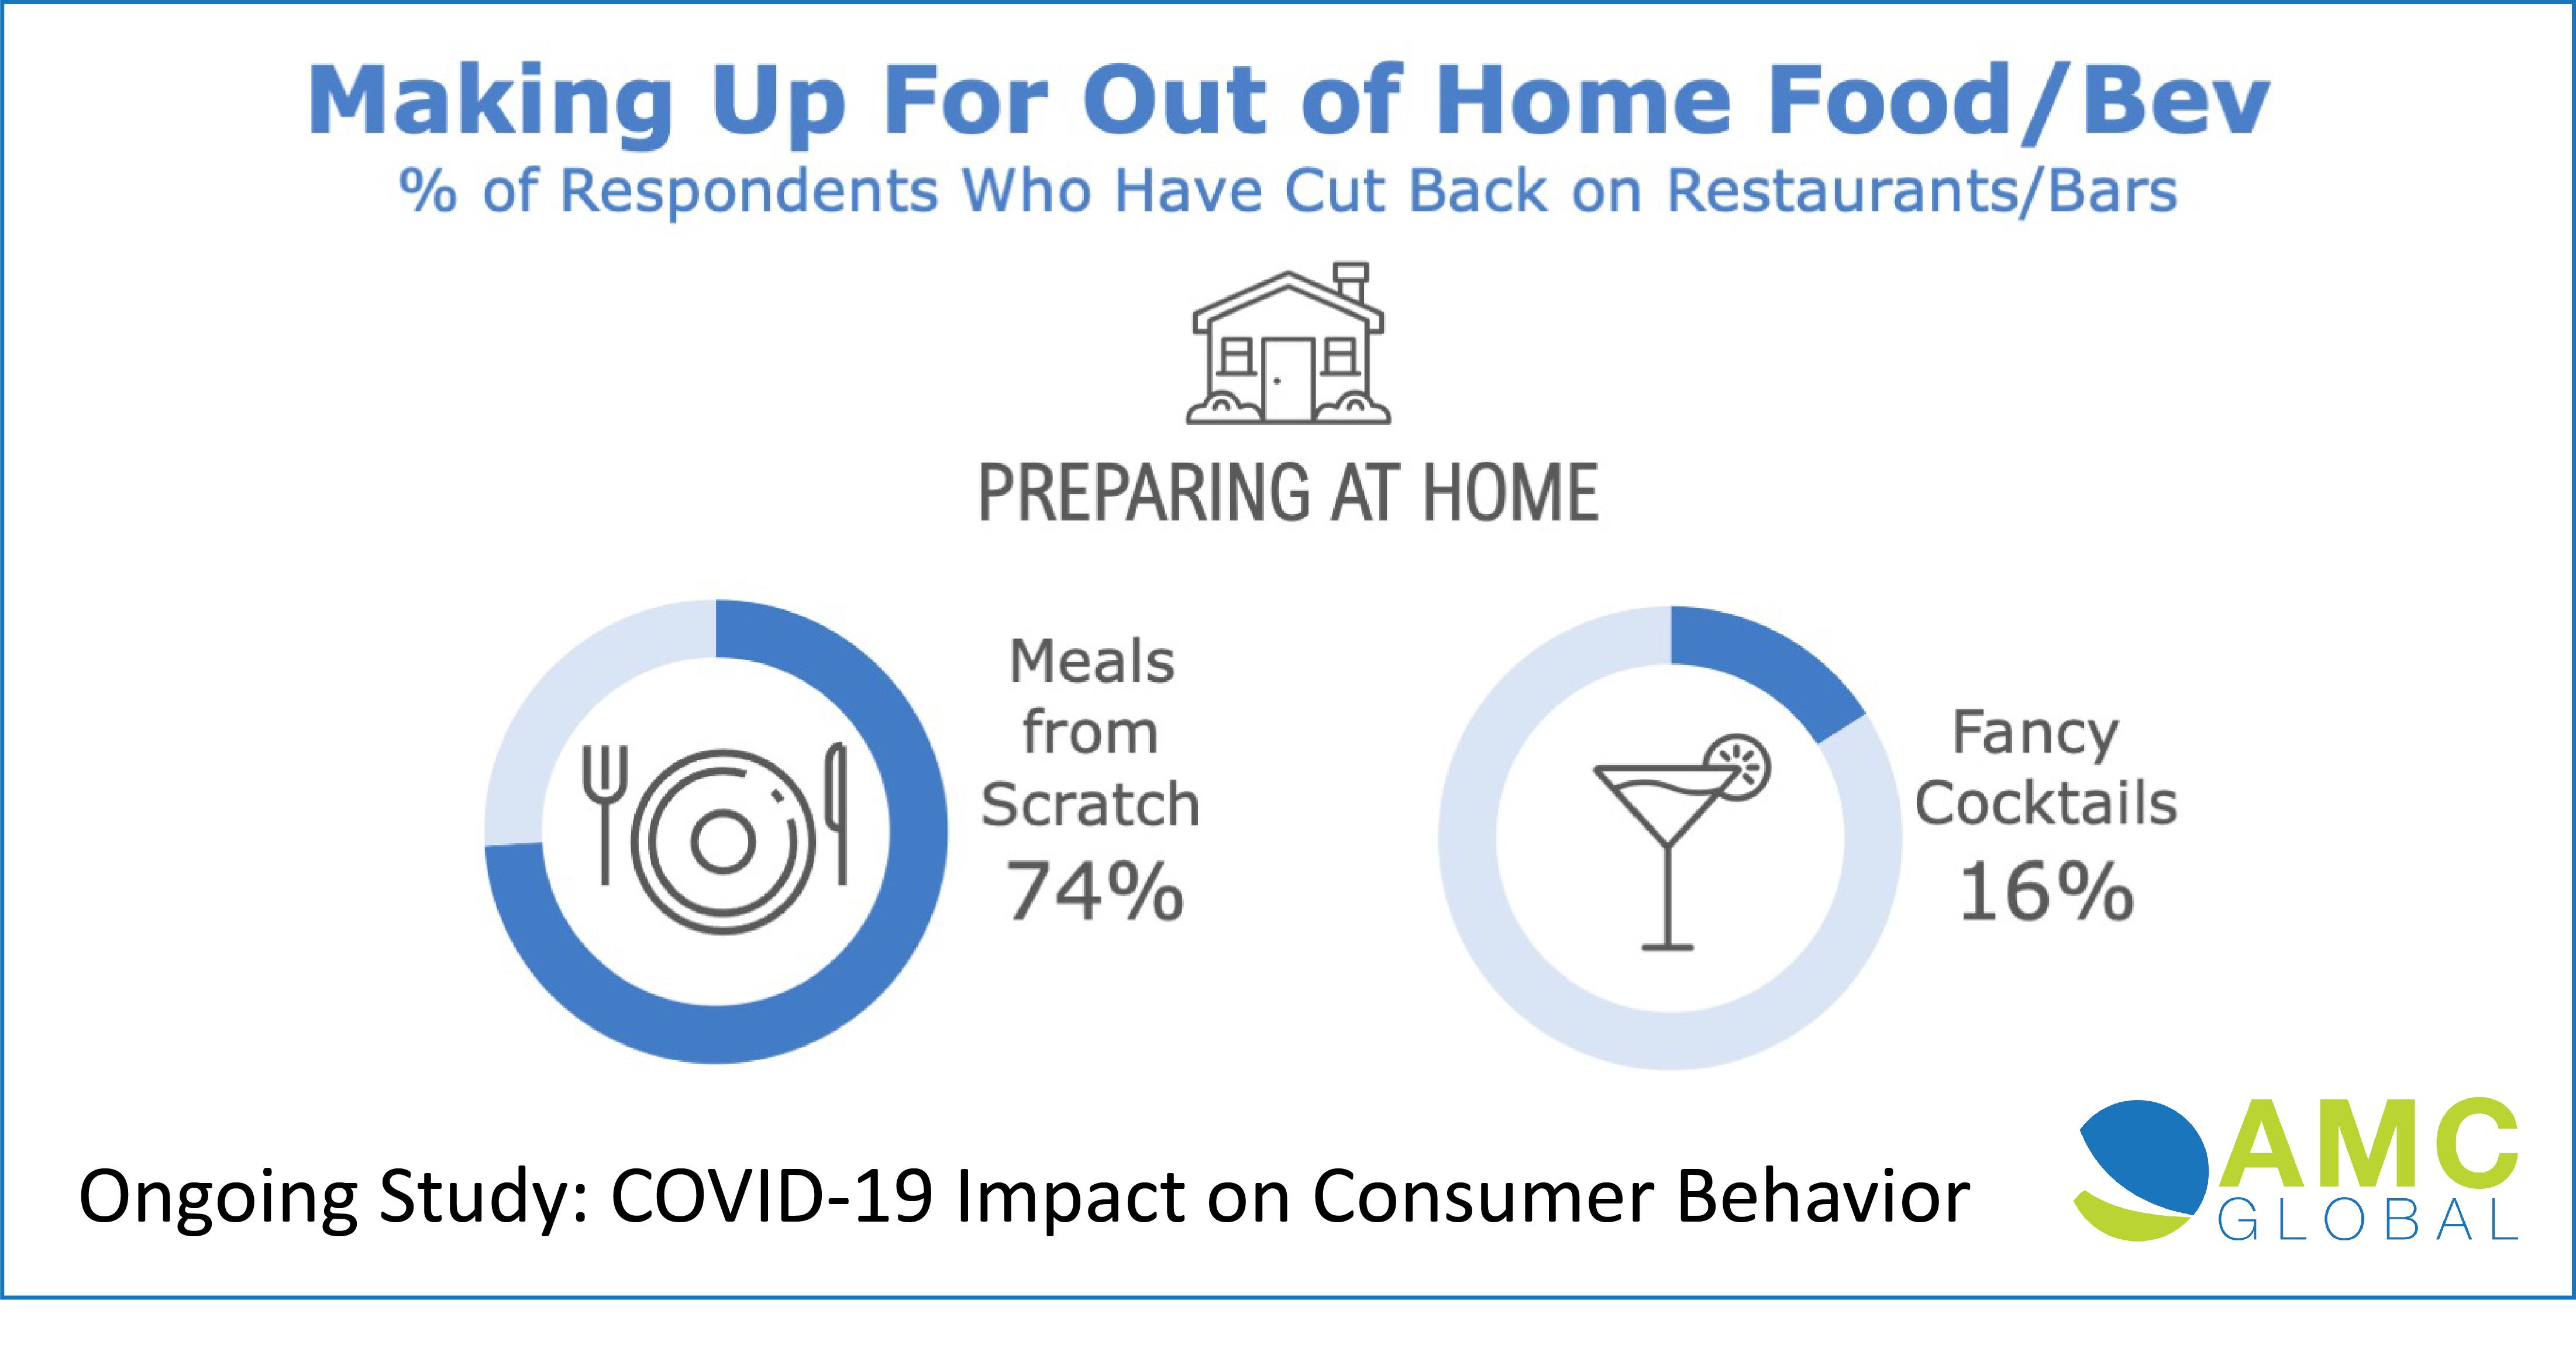 Consumer Habits During Covid-19